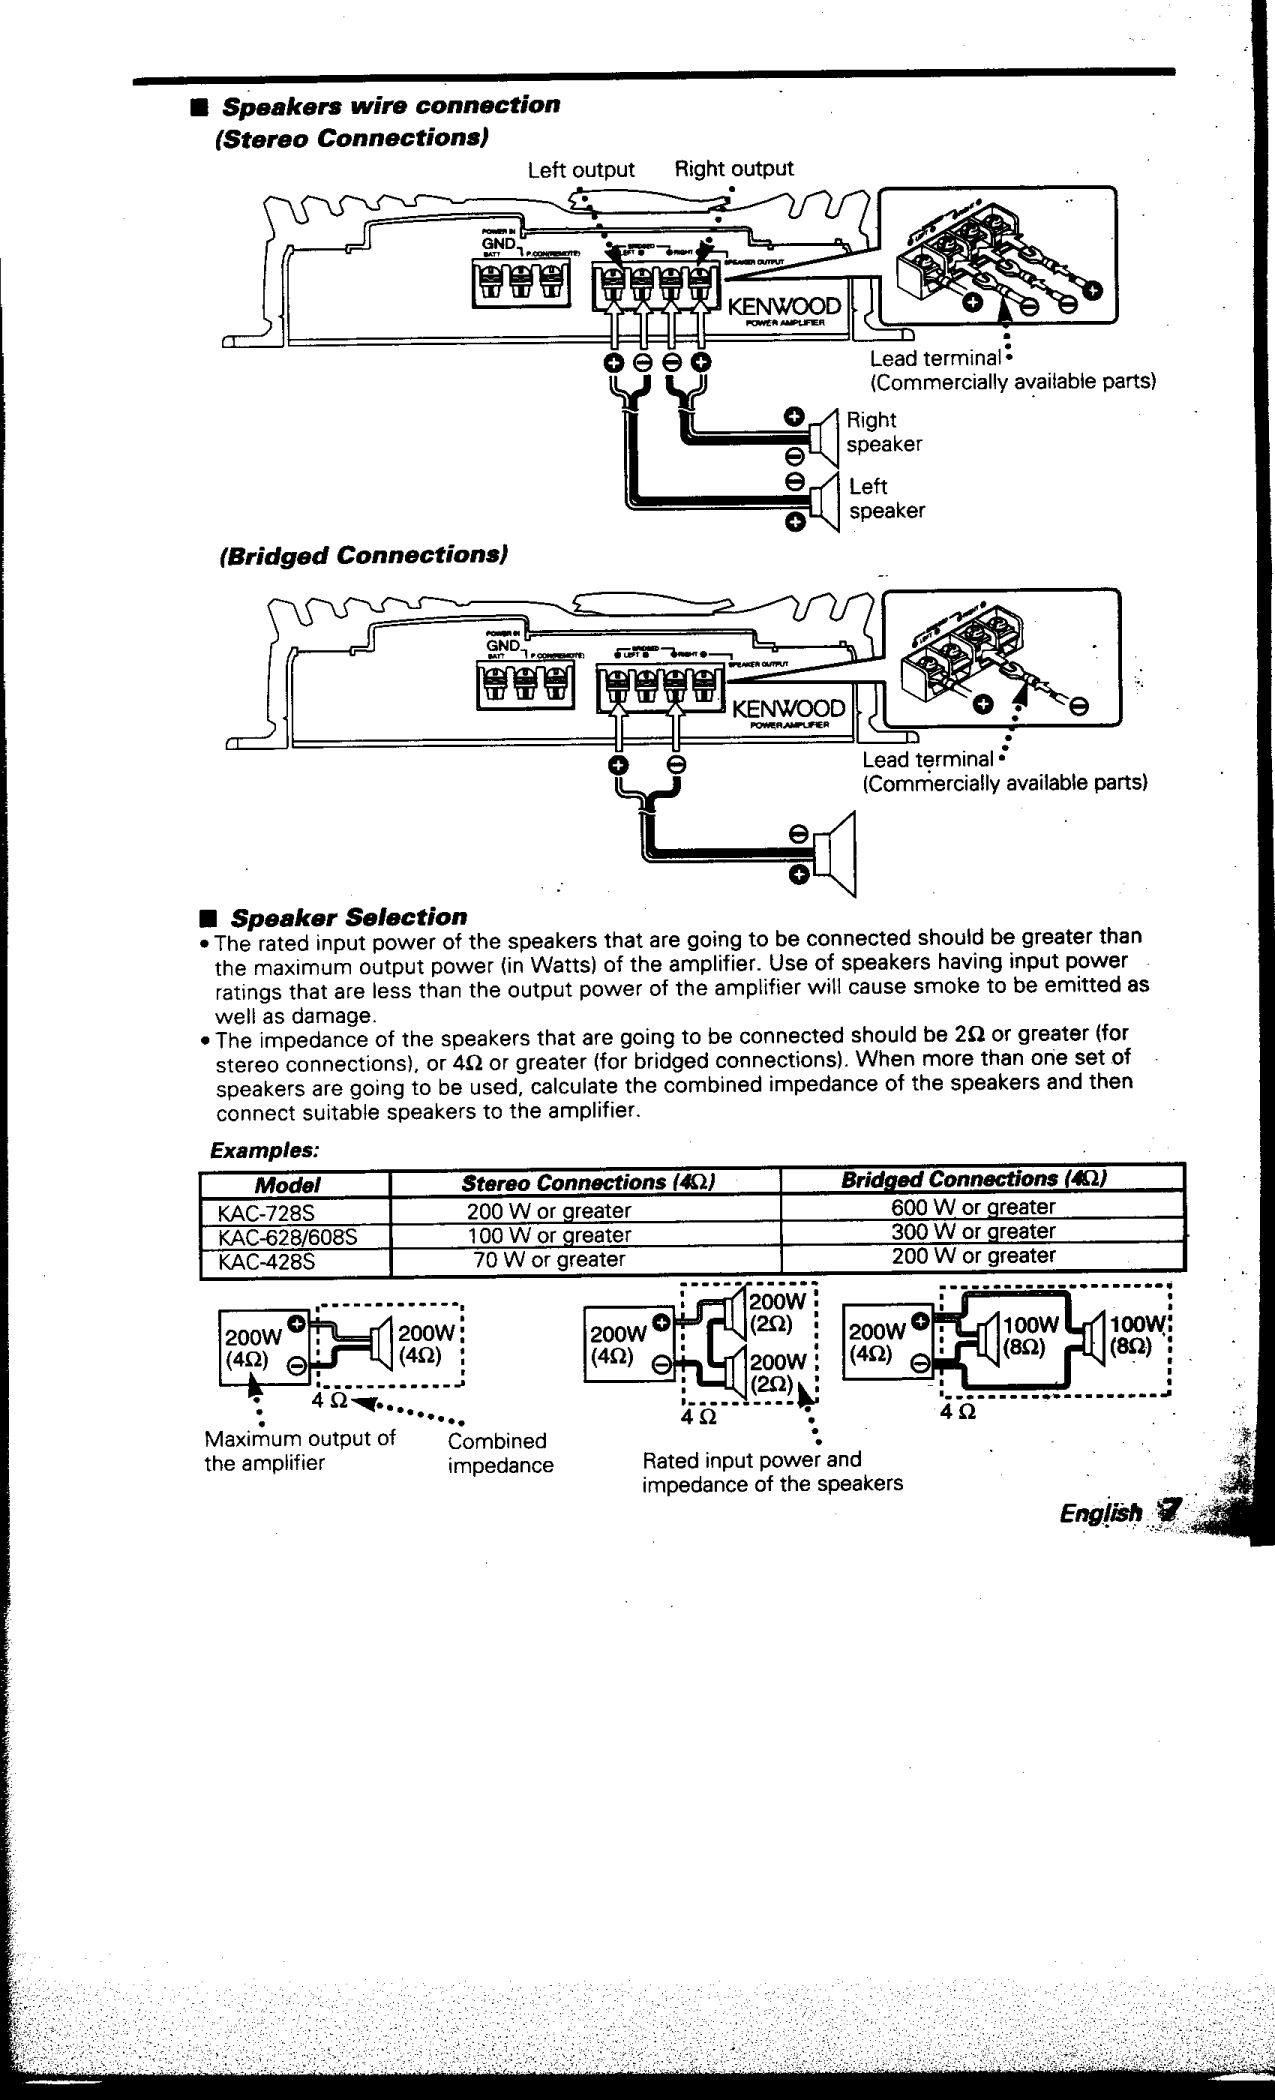 Wiring Diagram Kenwood Amplifier Kac 4285 Electrical Ddx7015 Pdf Manual For Car 428s Rh Umlib Com Speakers Jl 882